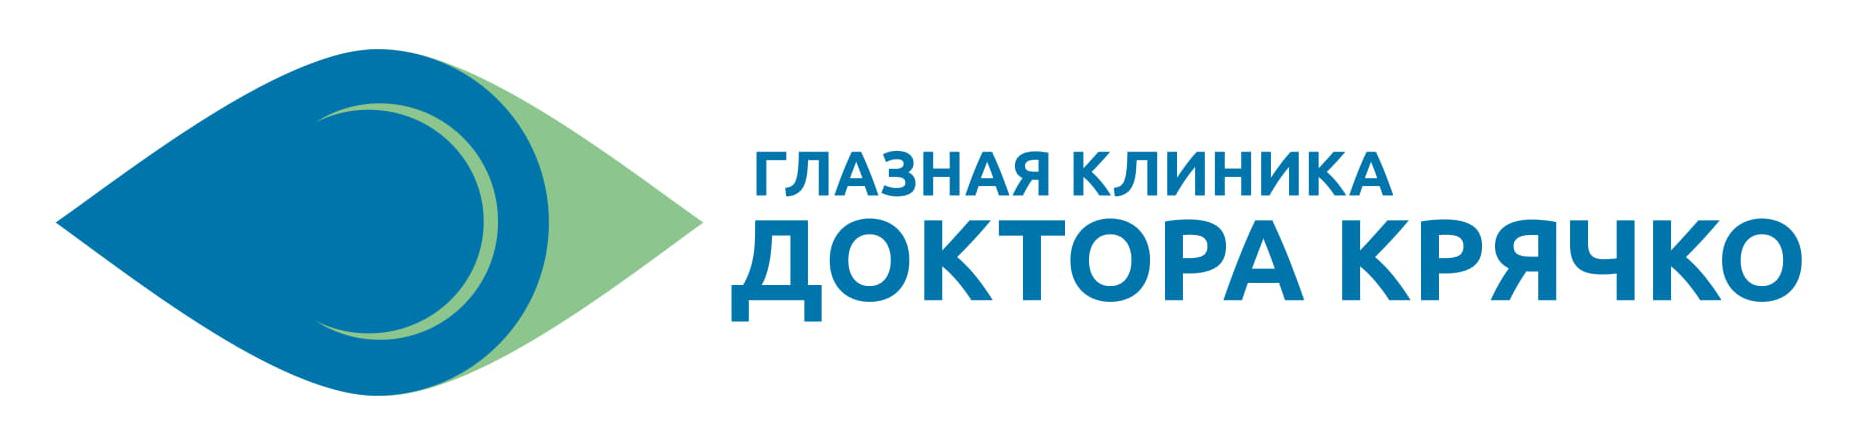 Логотип клиники доктора Крячко